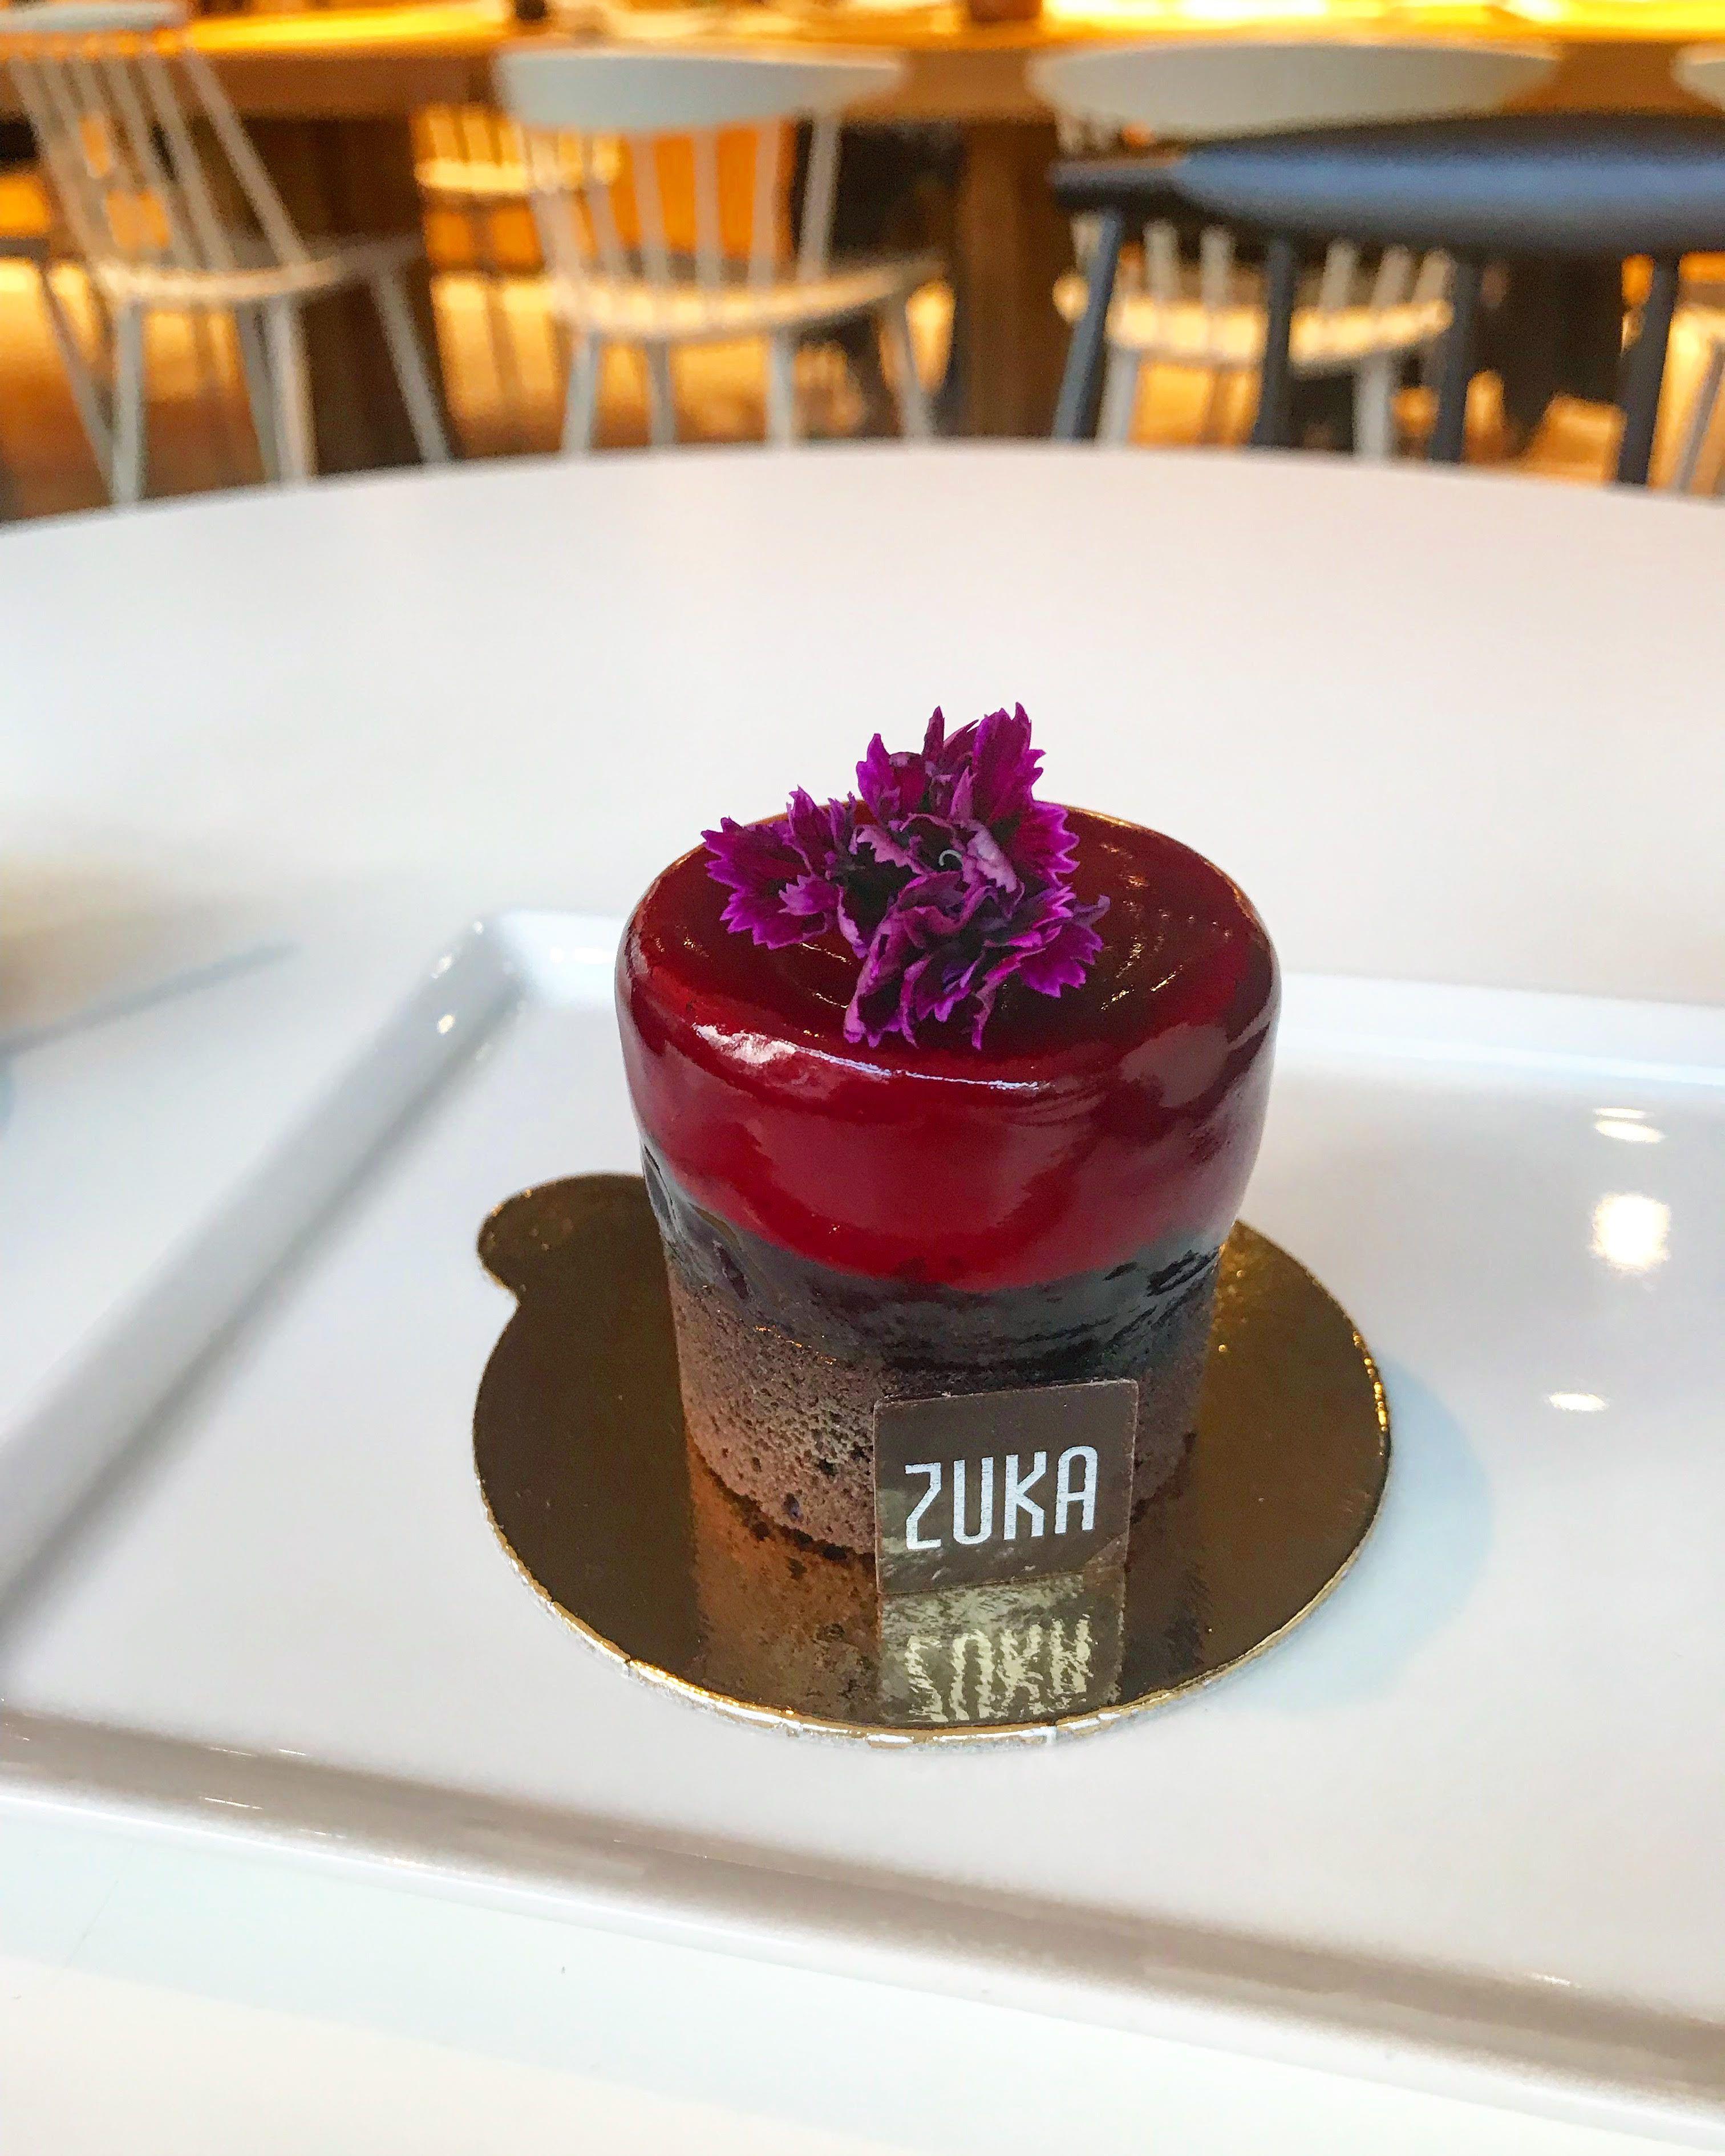 Zuka Berlin